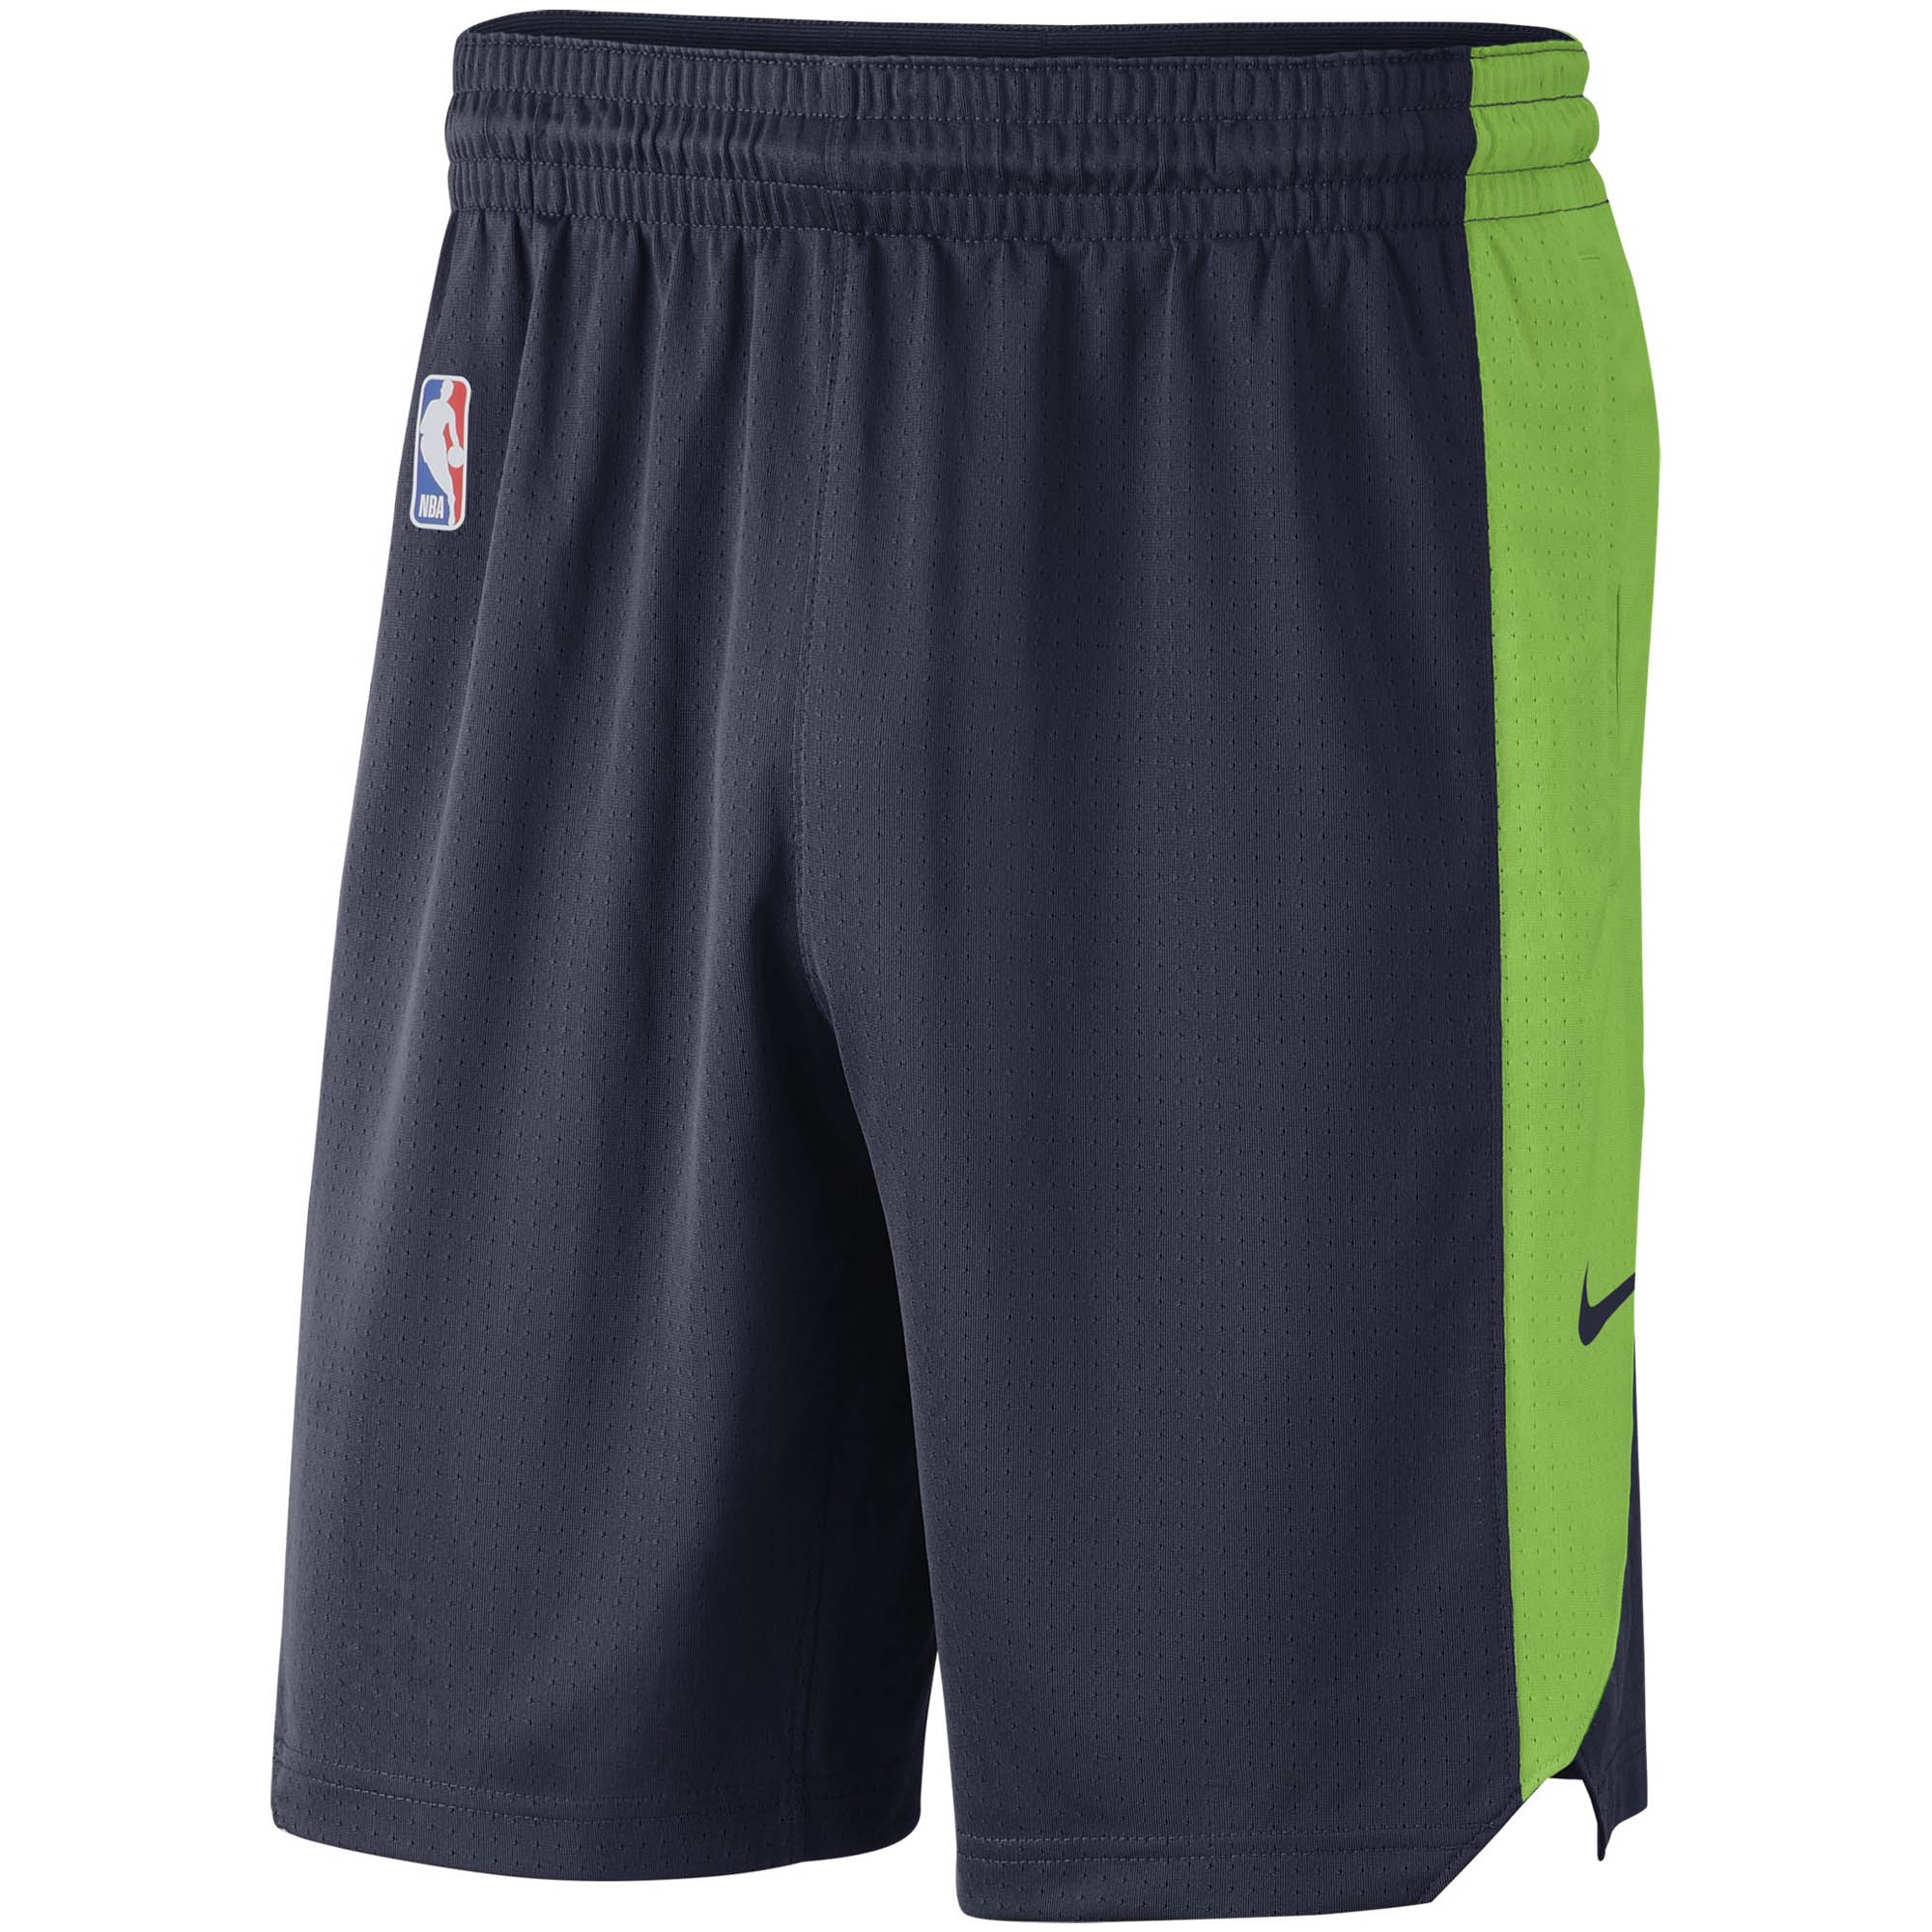 Minnesota Timberwolves Nike Performance Practice Shorts - Navy